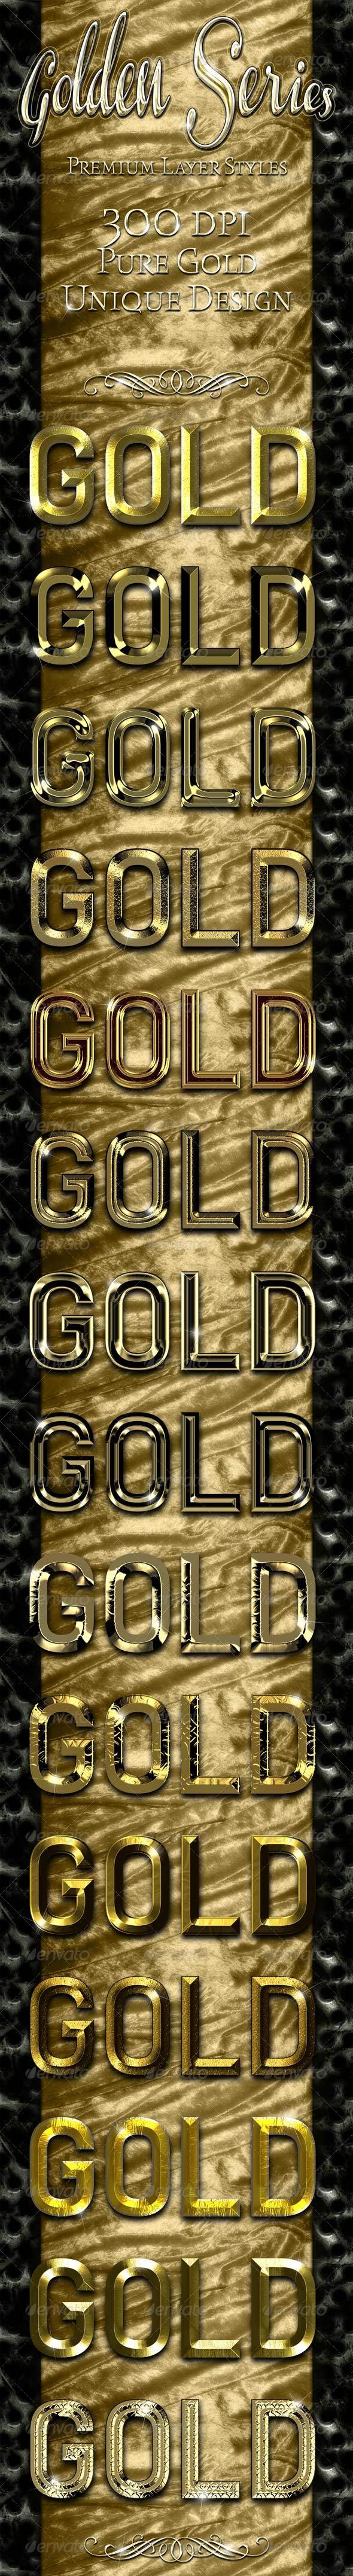 GraphicRiver Golden Series Premium Layer Styles 2283264